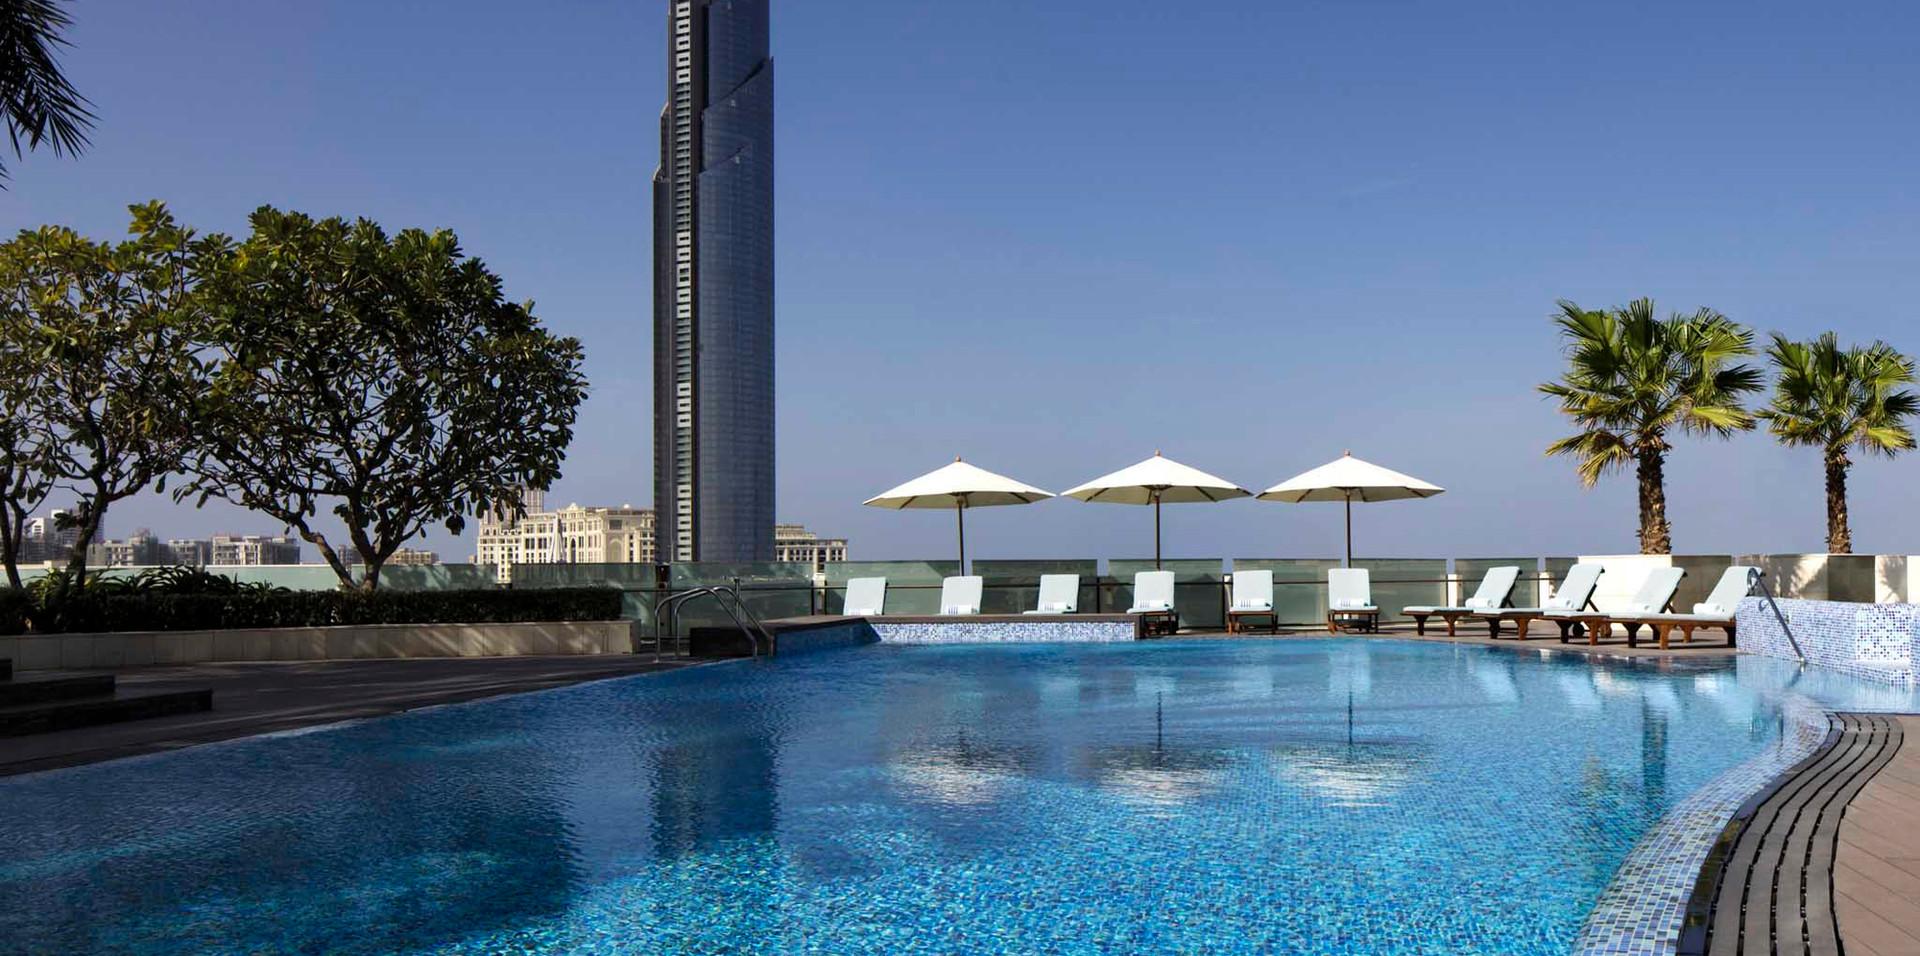 Crowne Plaza Pool